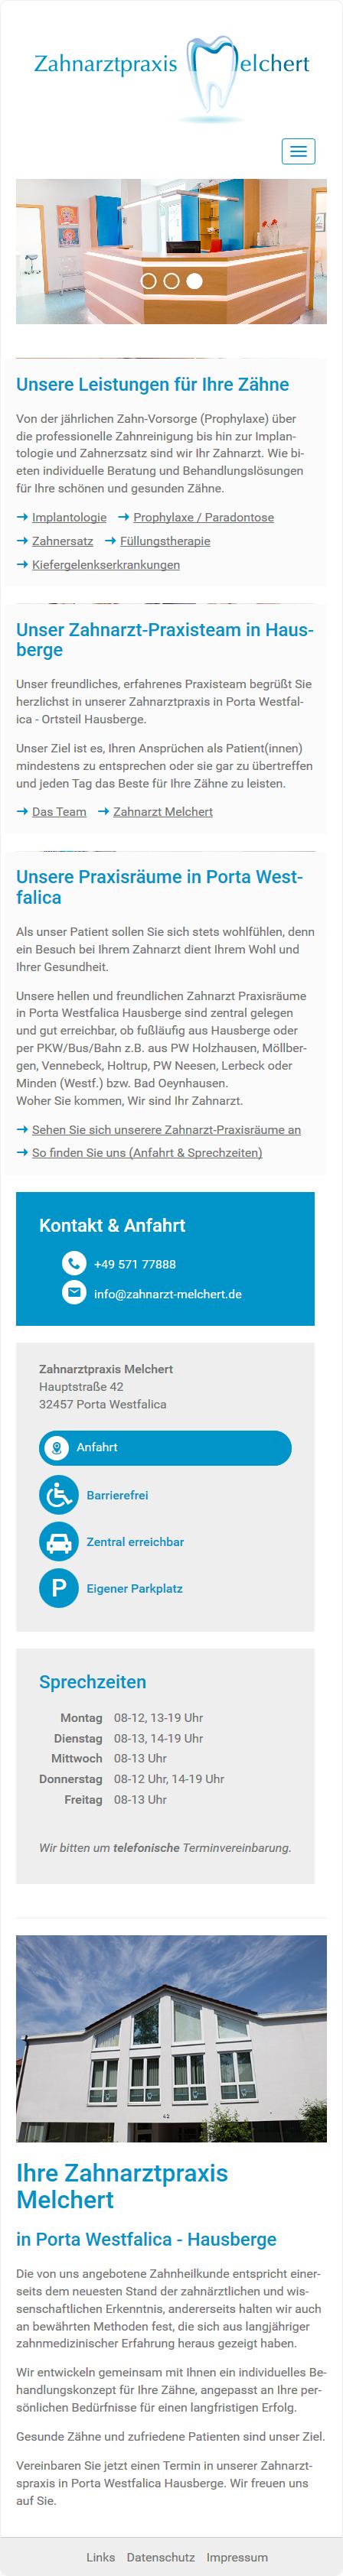 Smartphone Darstellung - Webdesign Porta Westfalica Zahnarztpraxis Melchert